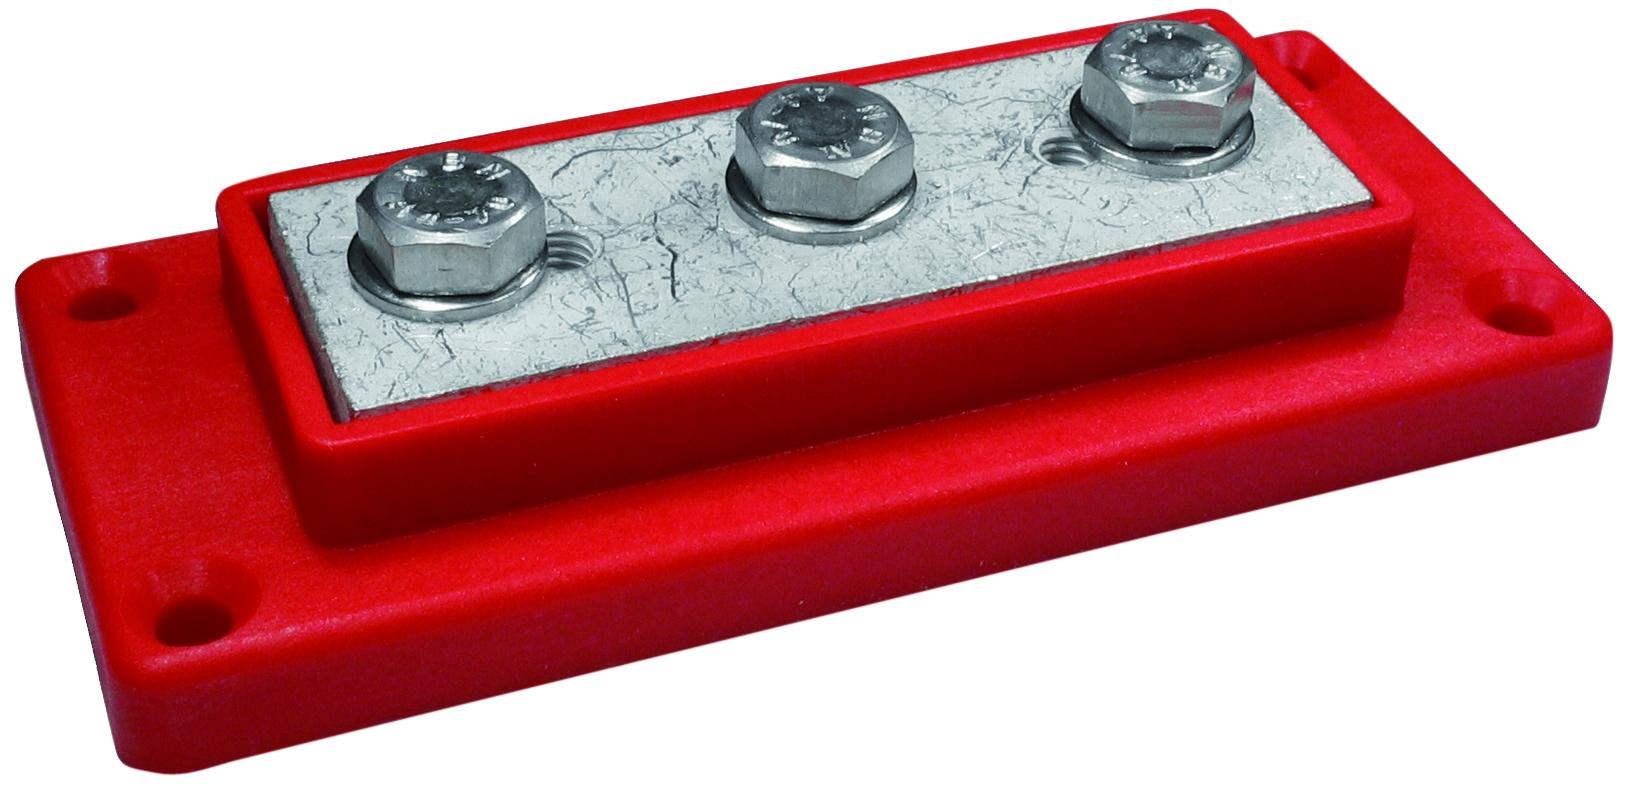 Kopplingsplint röd 3 x 95 mm²